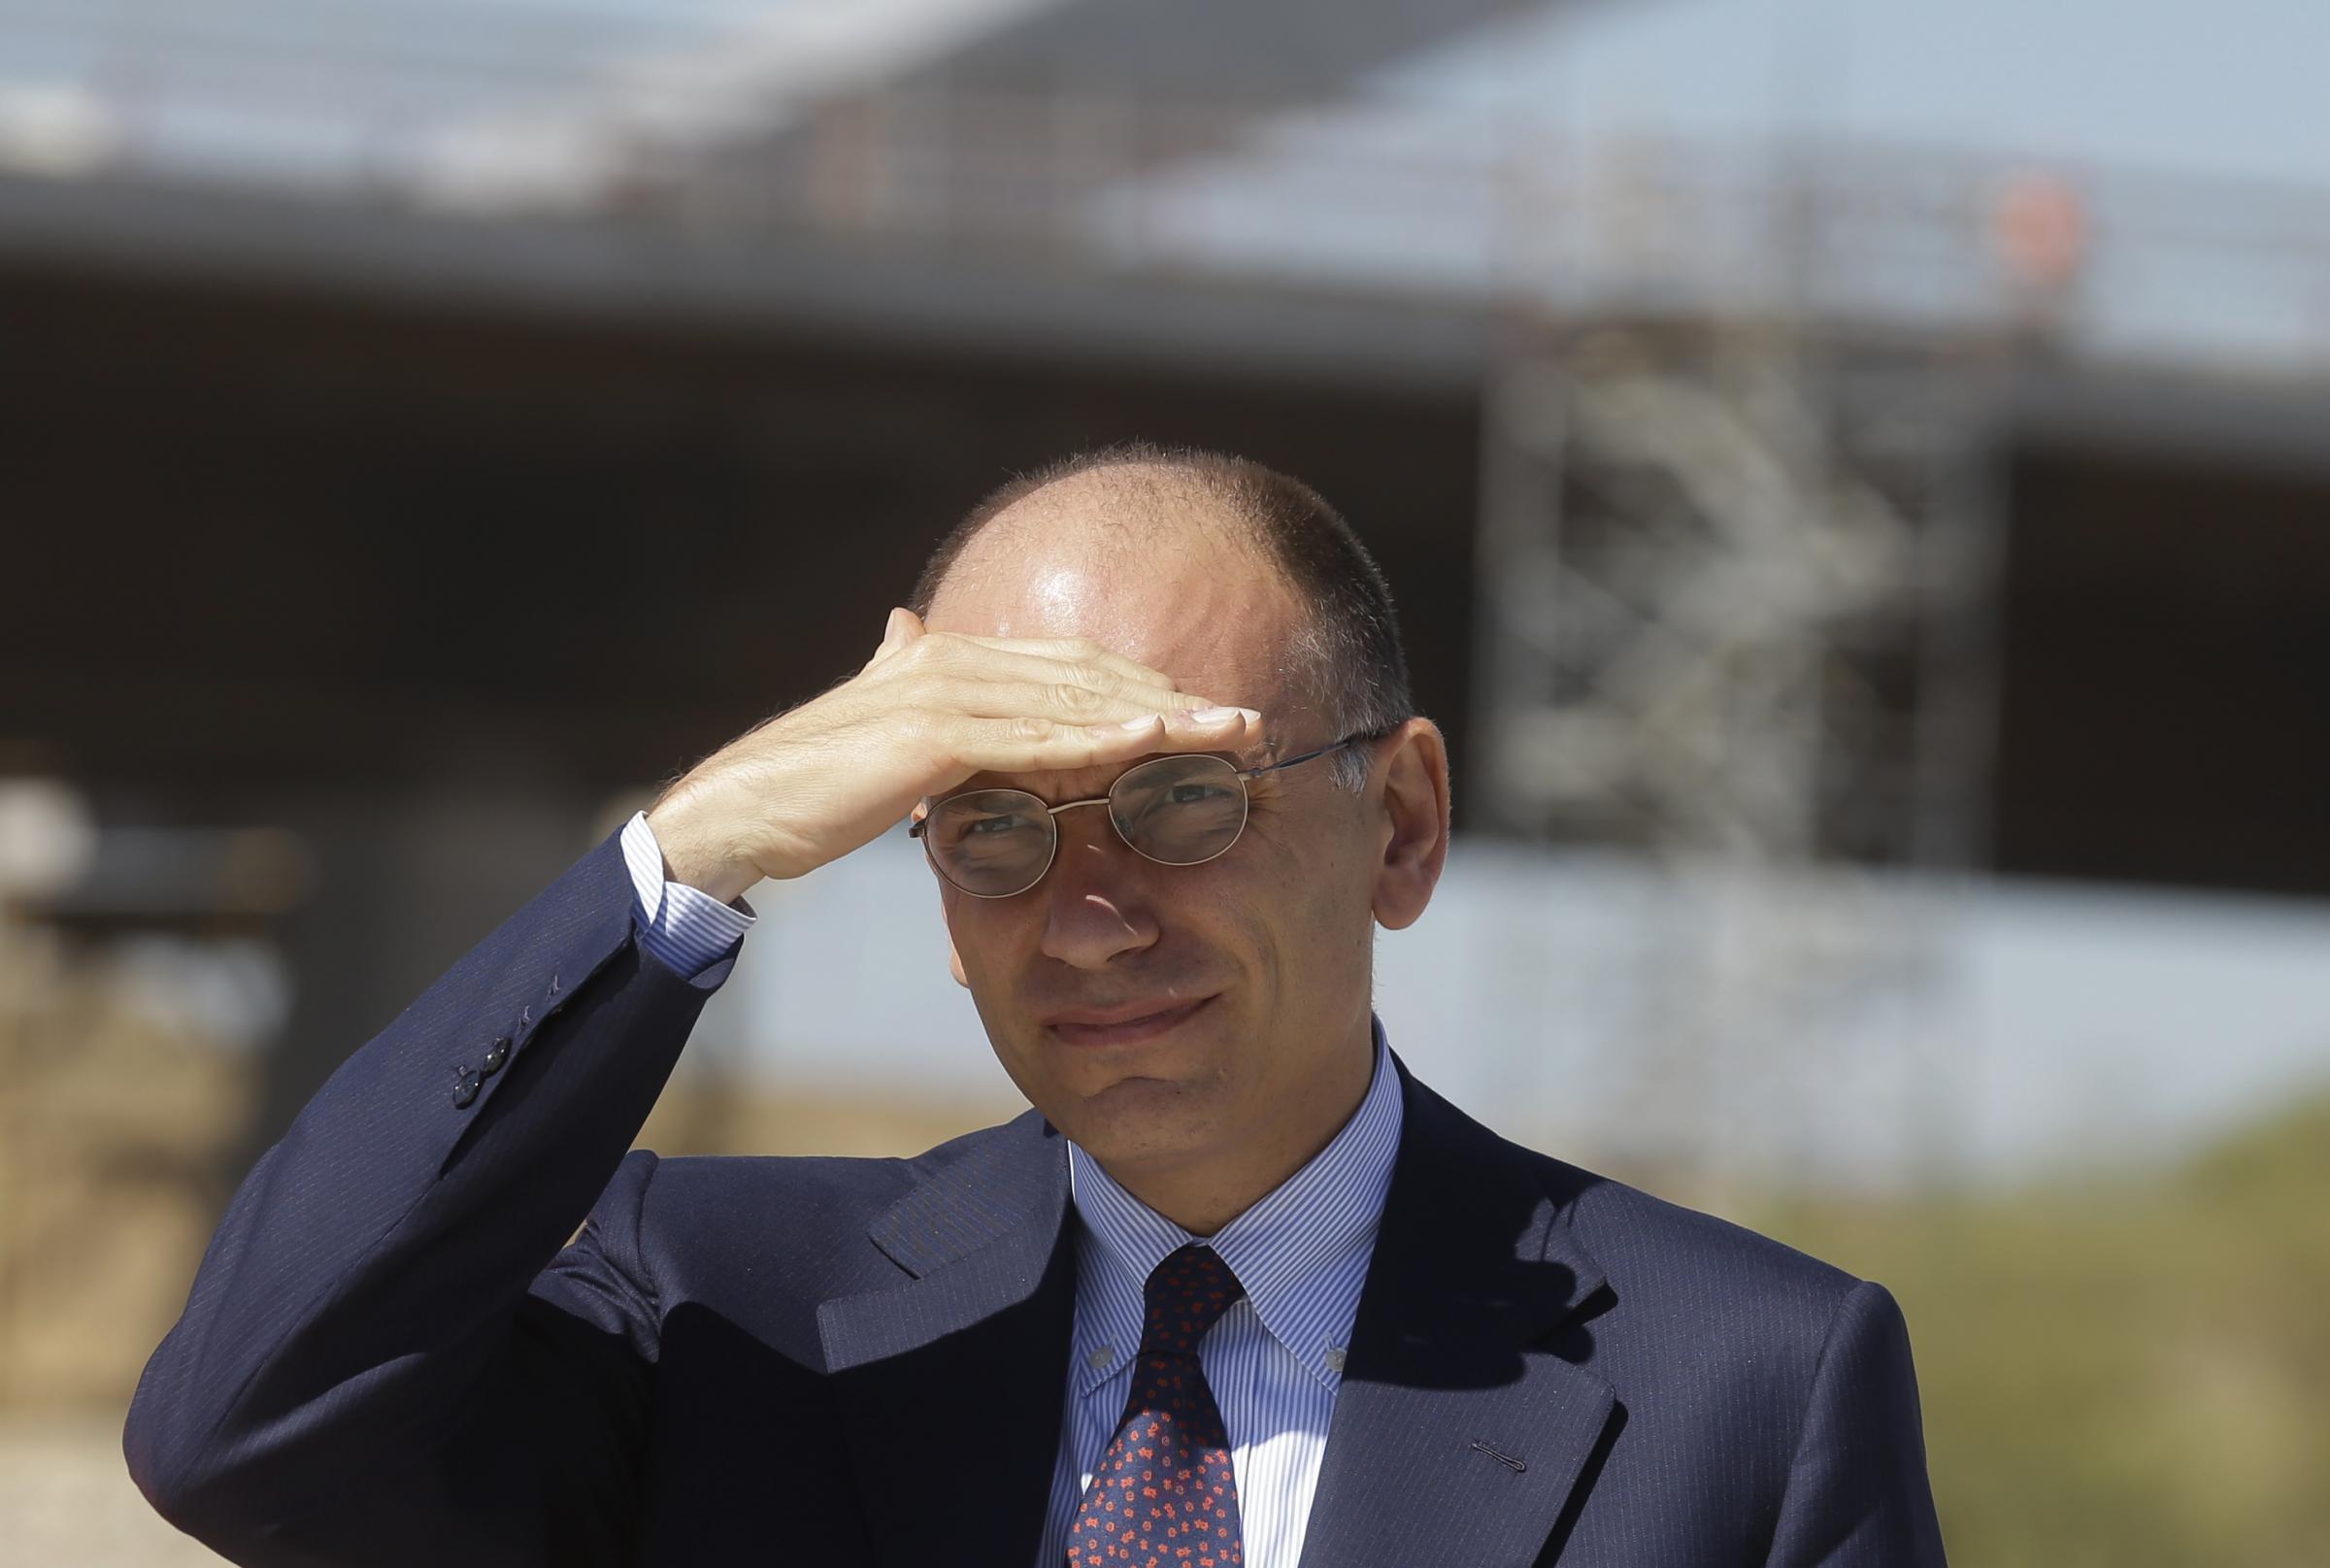 Enrico Letta in visita ai cantieri Milano Expo 2015